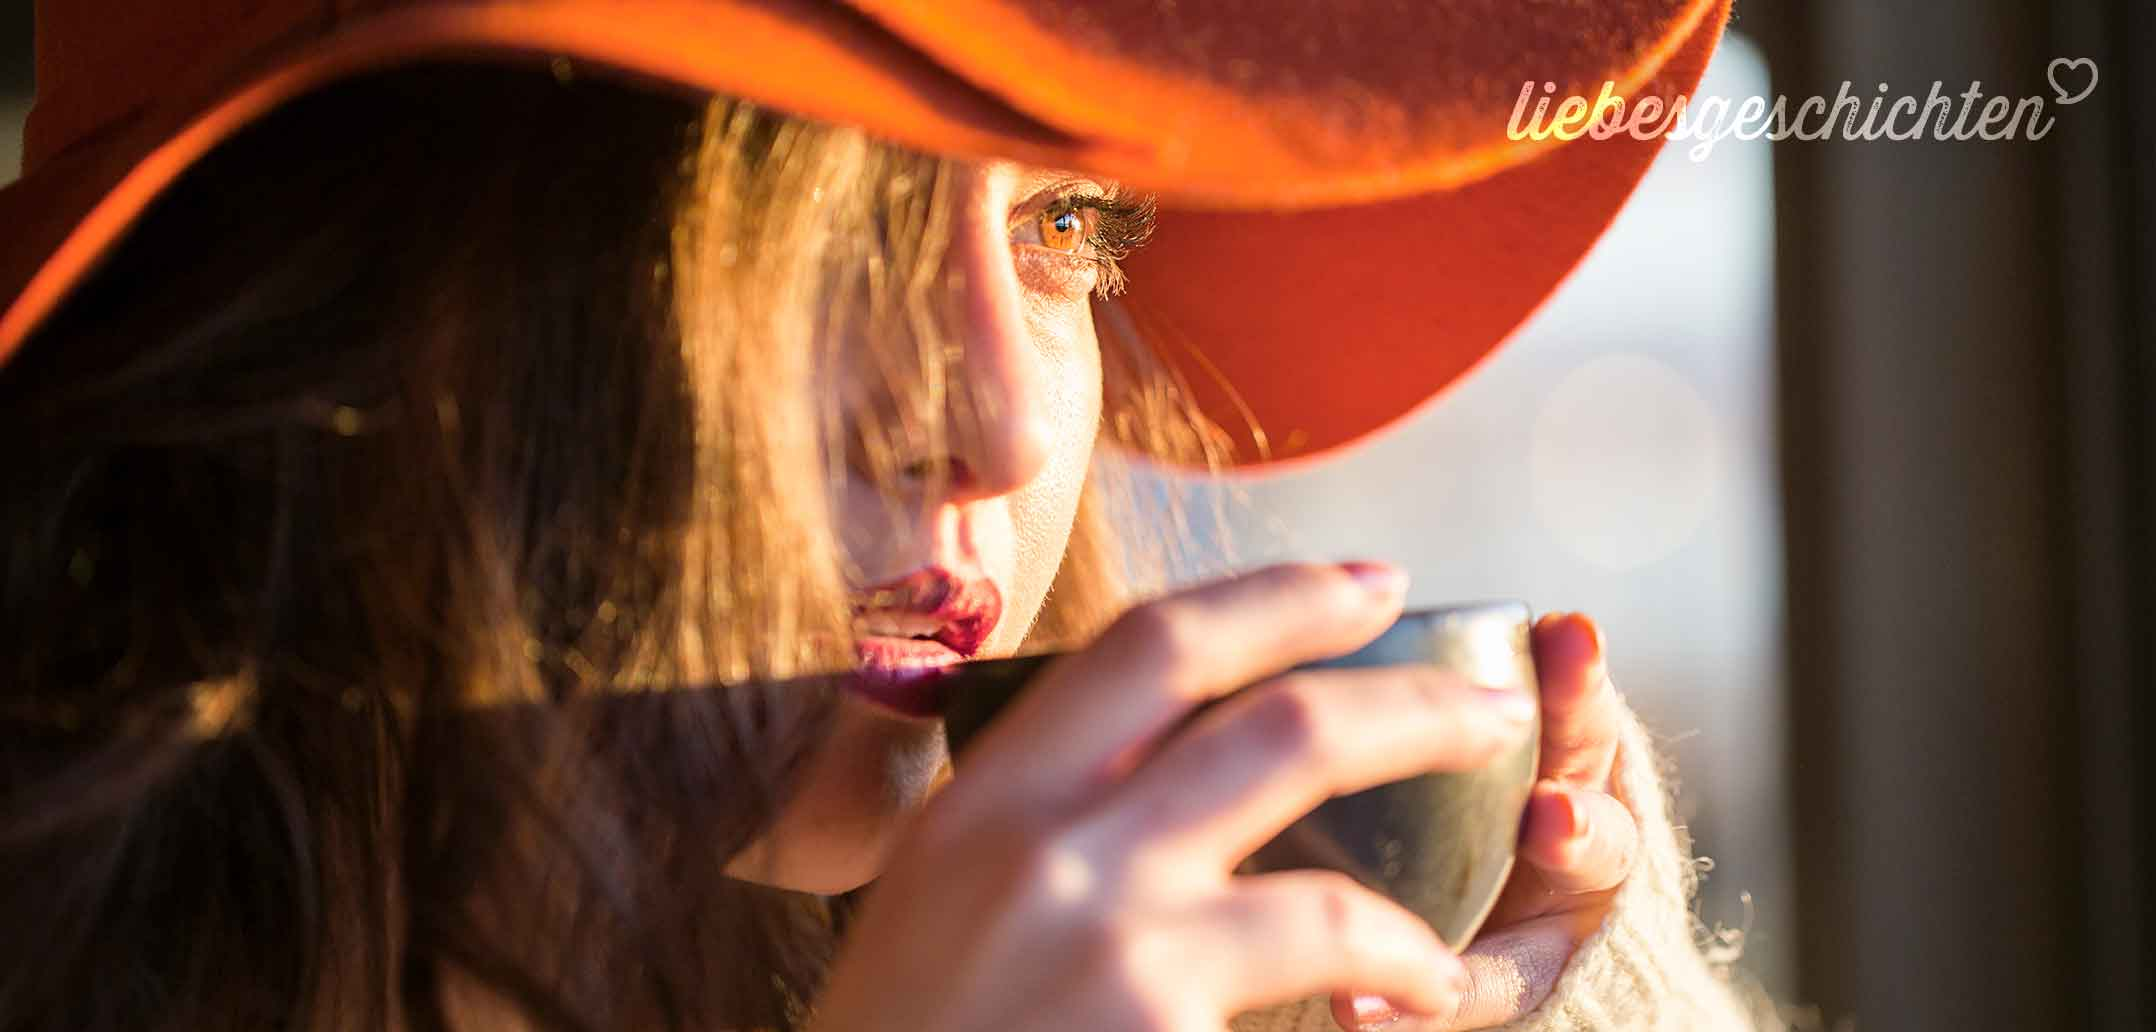 Ebru şallı snapchat+ 18